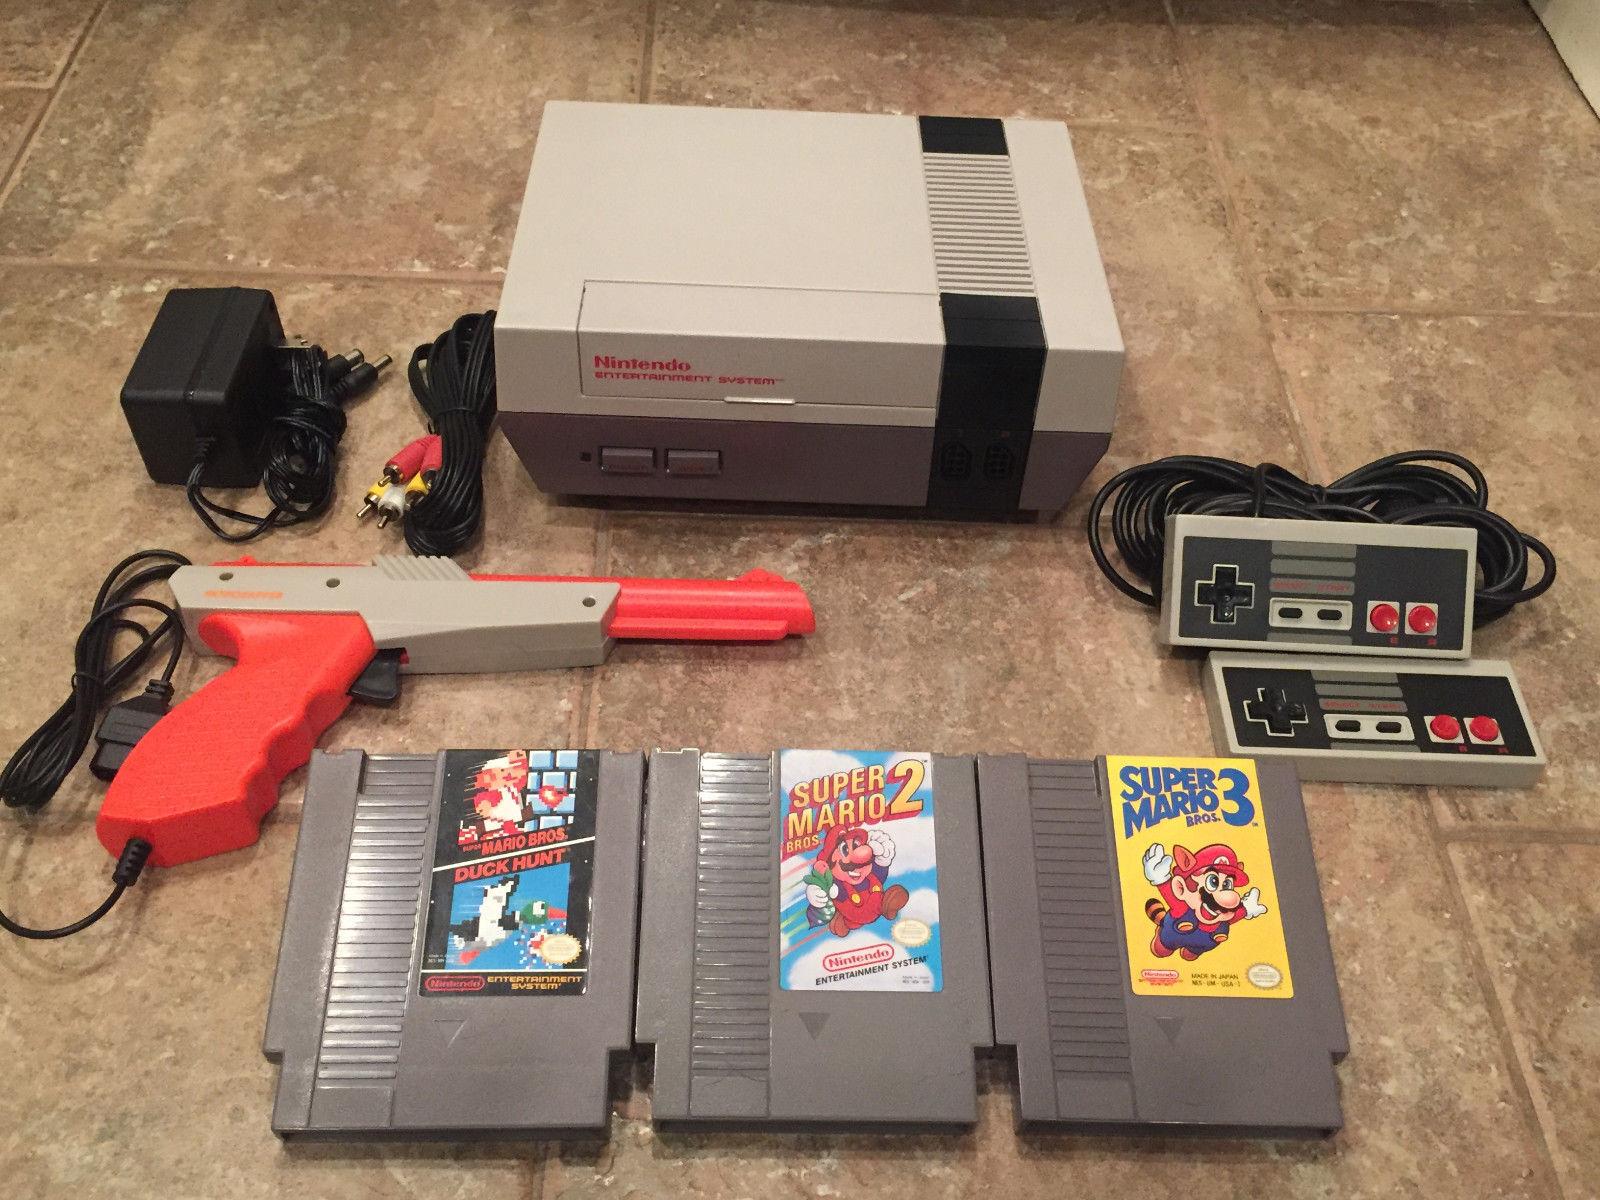 Nintendo Nes Console System Super Mario Bros 1 2 3 Original OEM Polished 72 Pin  Super Mario Bros 1 2 3